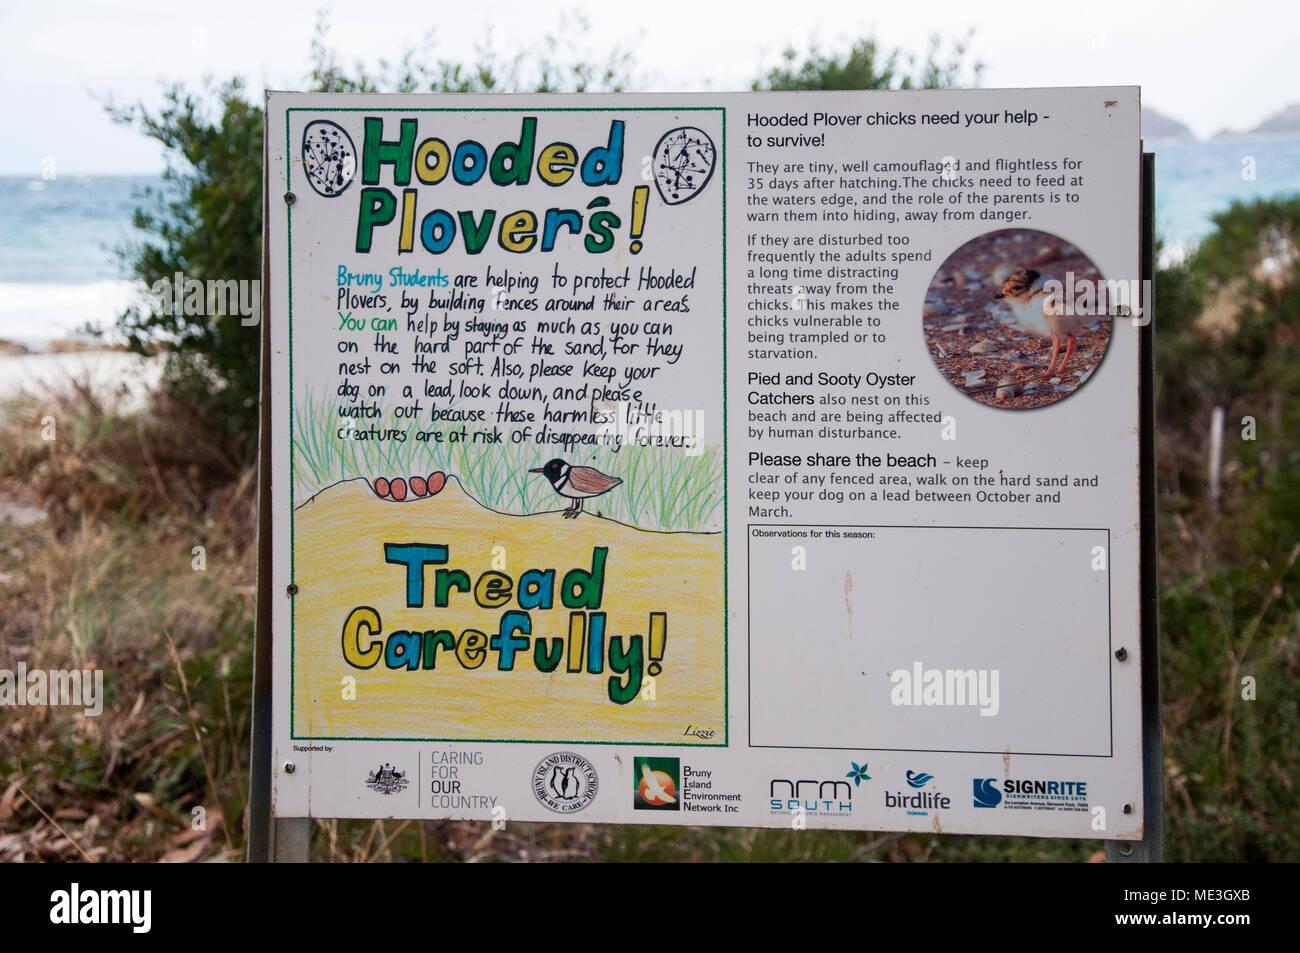 Hooded plover conservation initiative by local schoolchildren at Adventure Bay, Bruny Island, Tasmania, Australia Stock Photo